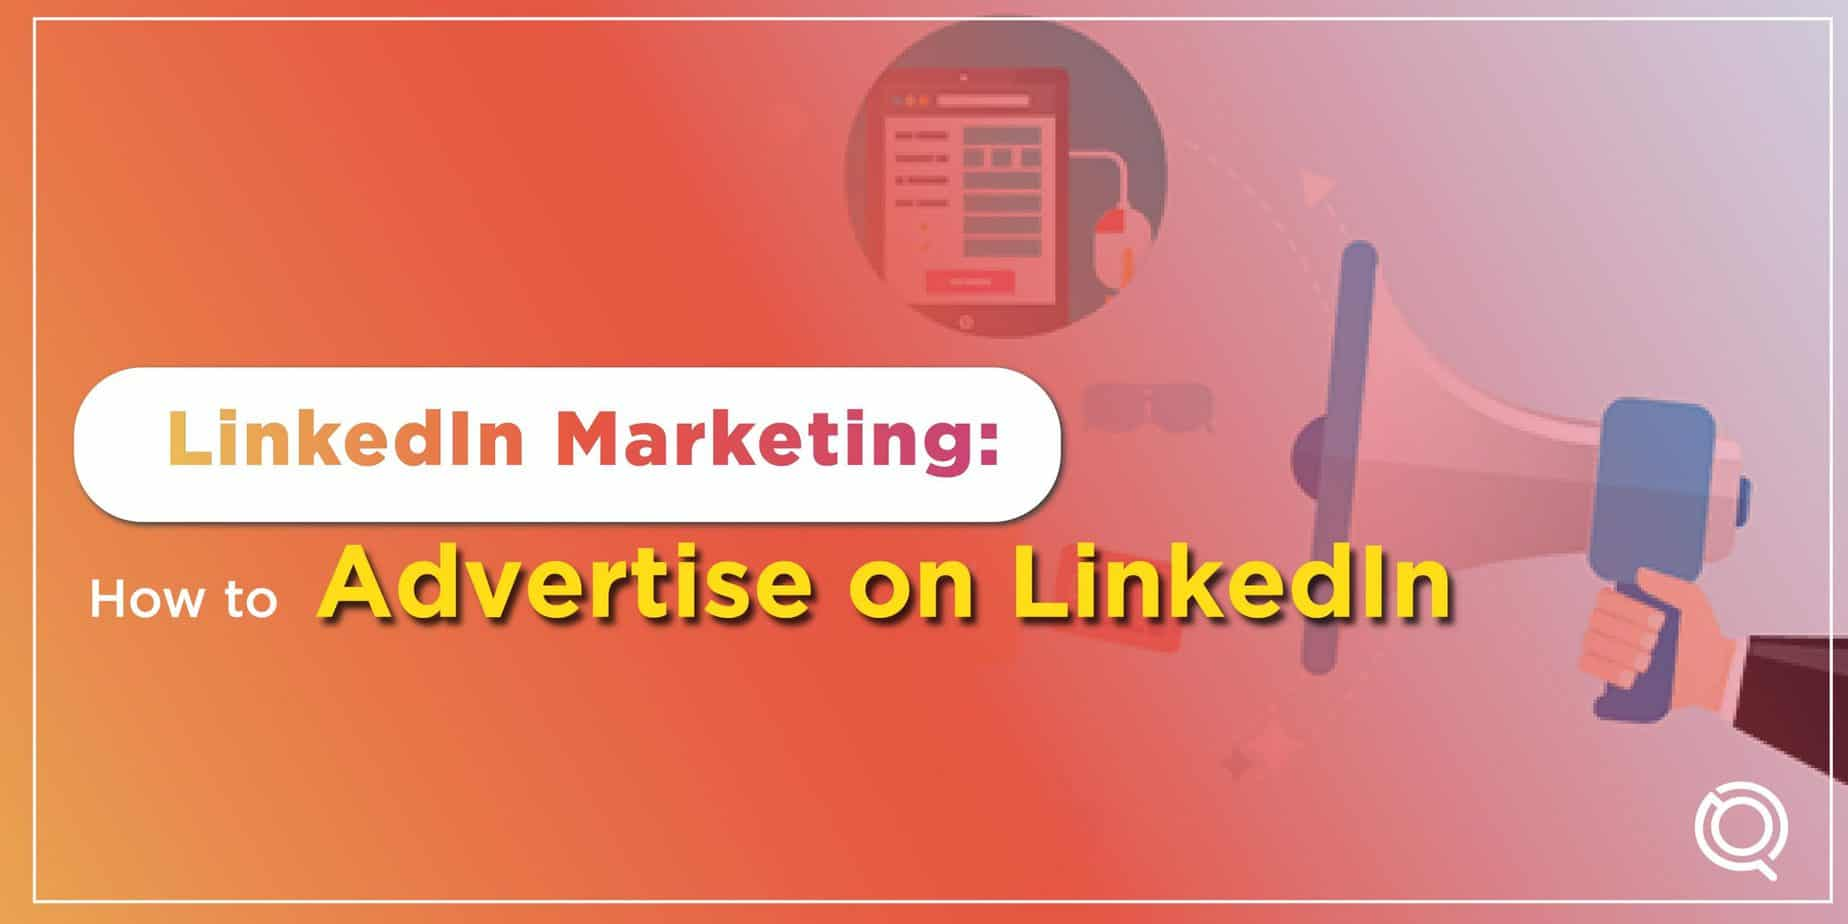 LinkedIn Marketing How to Advertise on LinkedIn - One Search Pro Digital Marketing Agency Malaysia